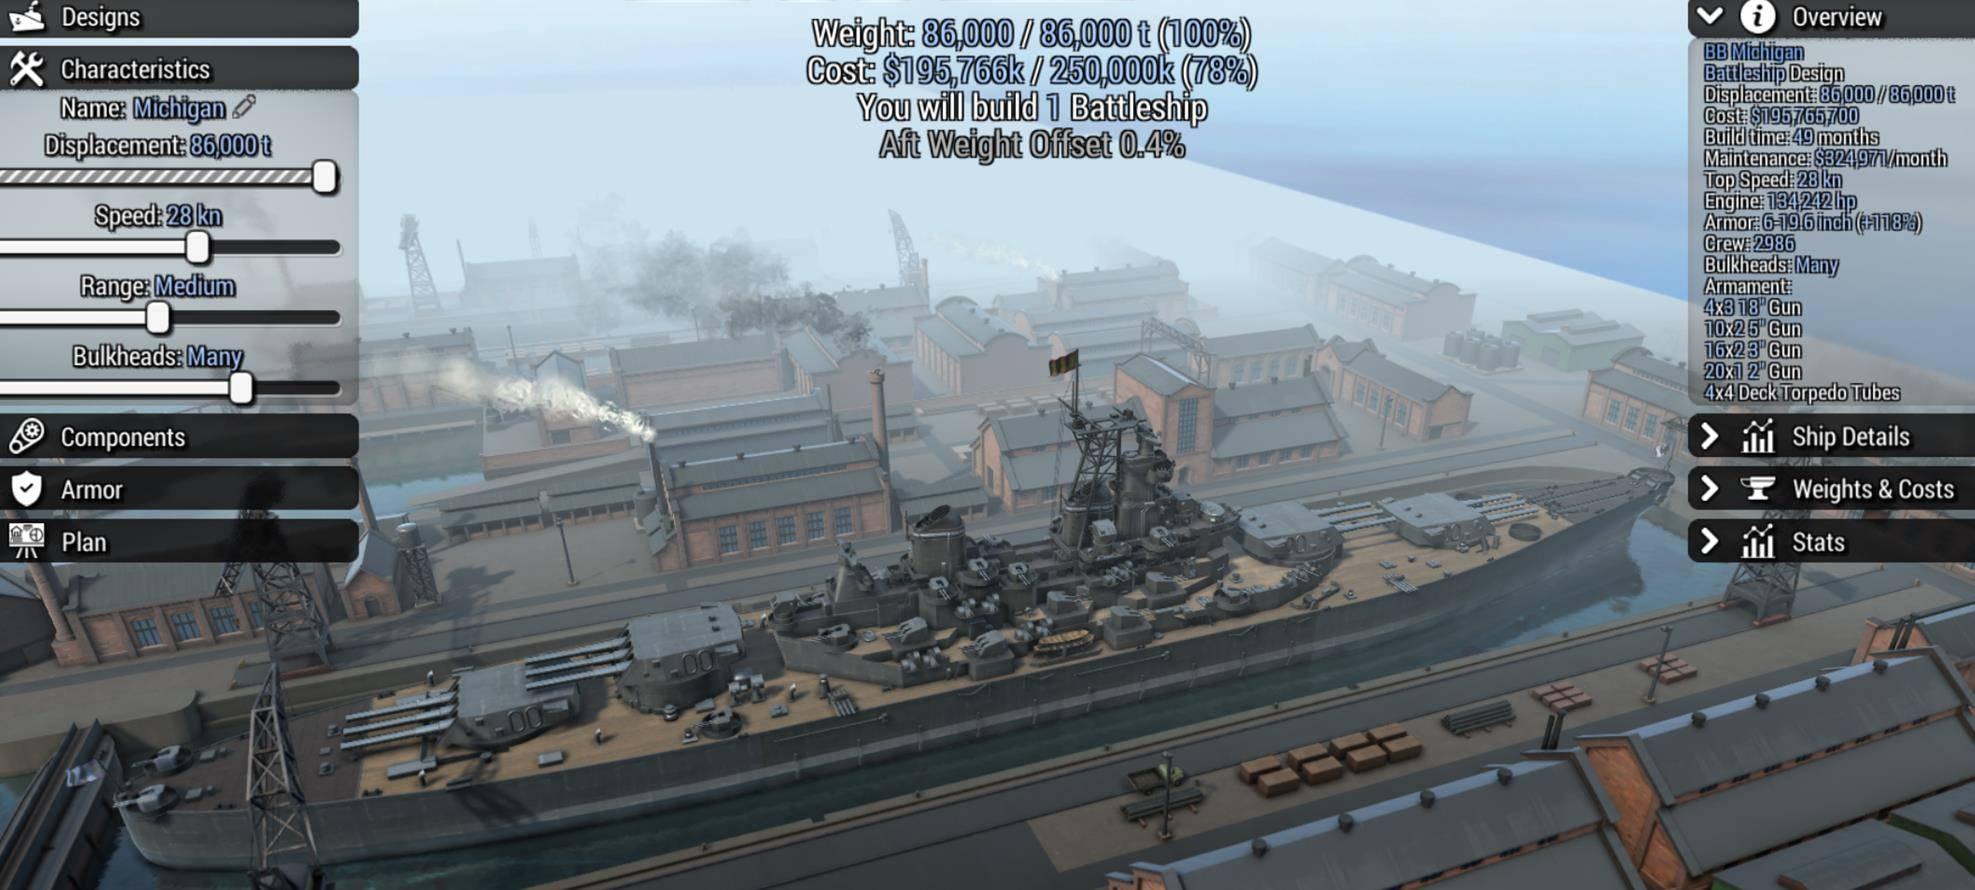 USS Michigan.jpg